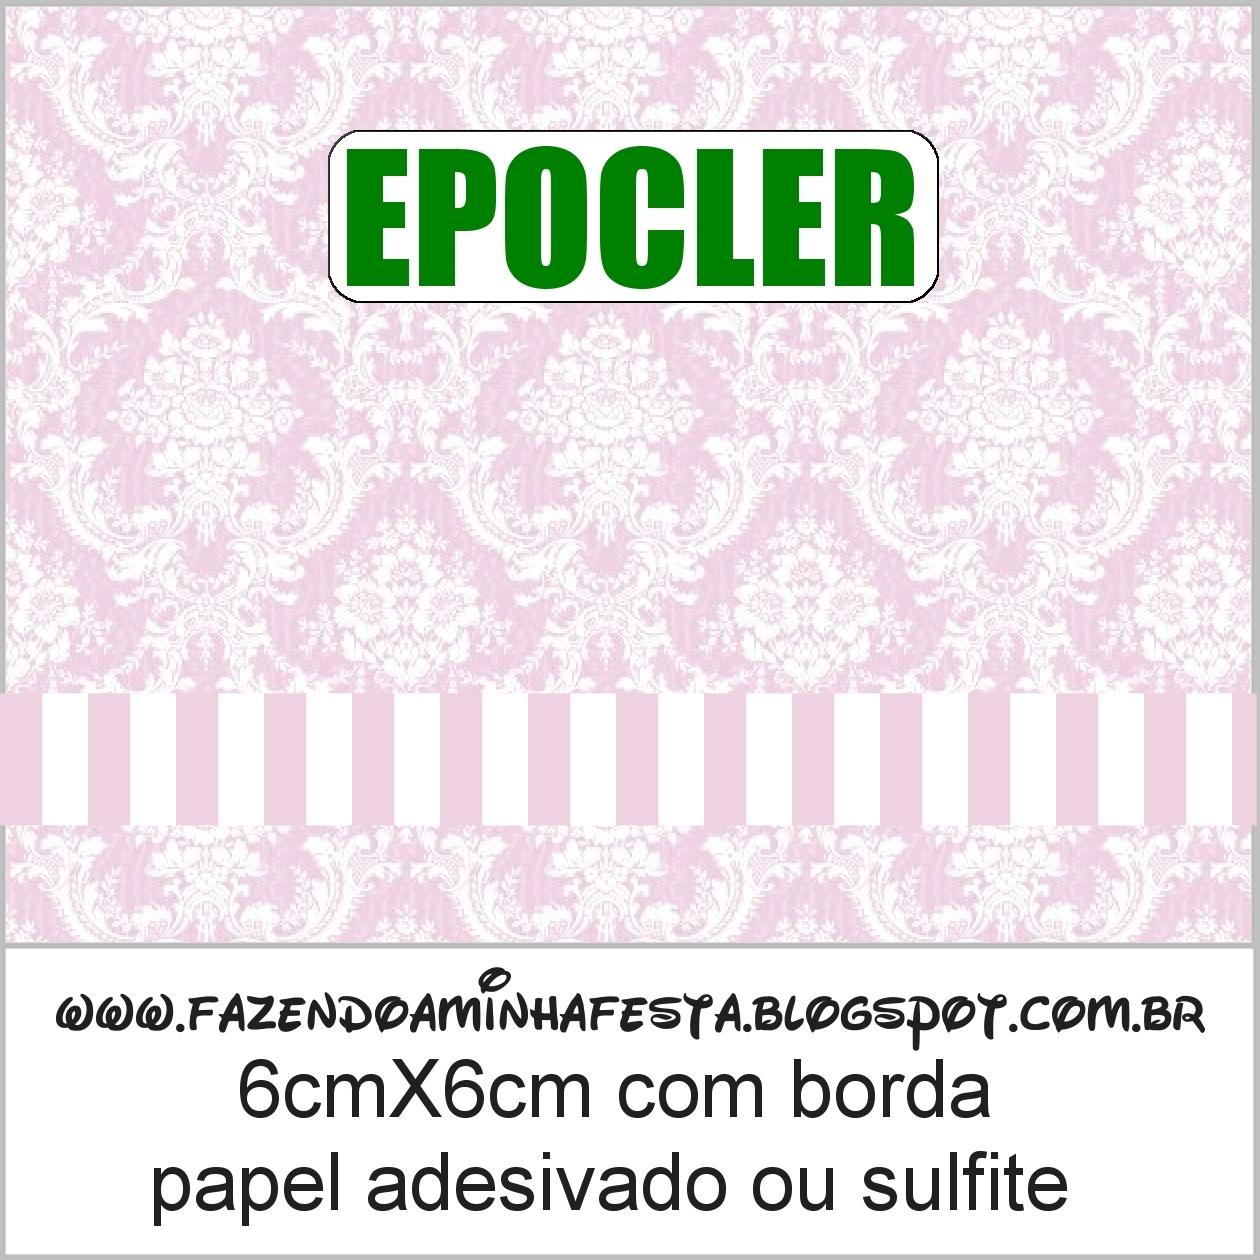 Kit Toilet Banheiro Rosa Provencal Fazendo A Minha Festa